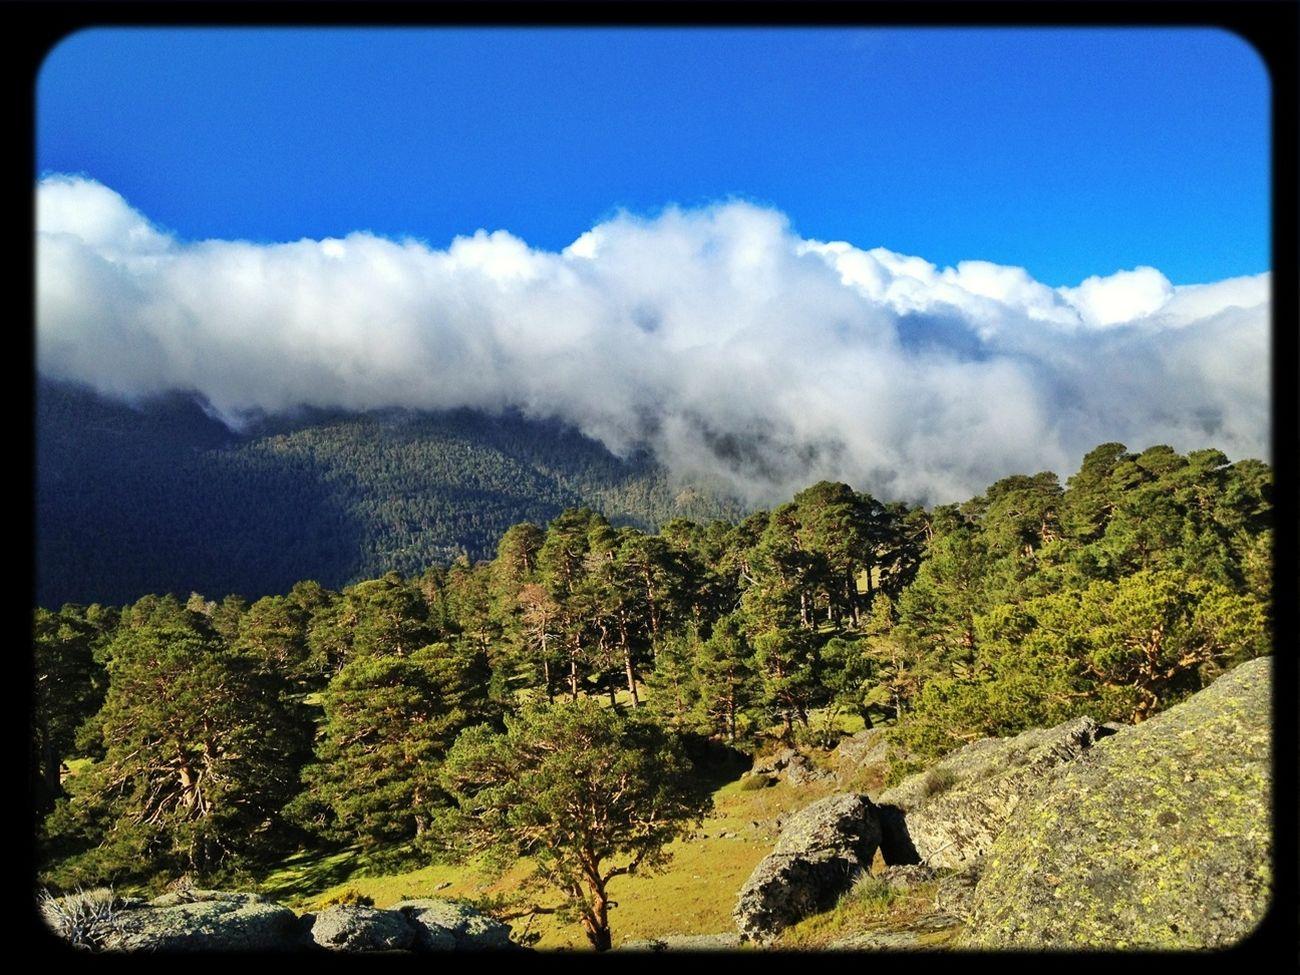 #trailrunning #CabezaMediana #valledelLozoya #training #gasss #dynafit #felineghost #mountain #ilovemountains #spring #primavera #beforework #SuuntoAmbitions #Dynafitfinde